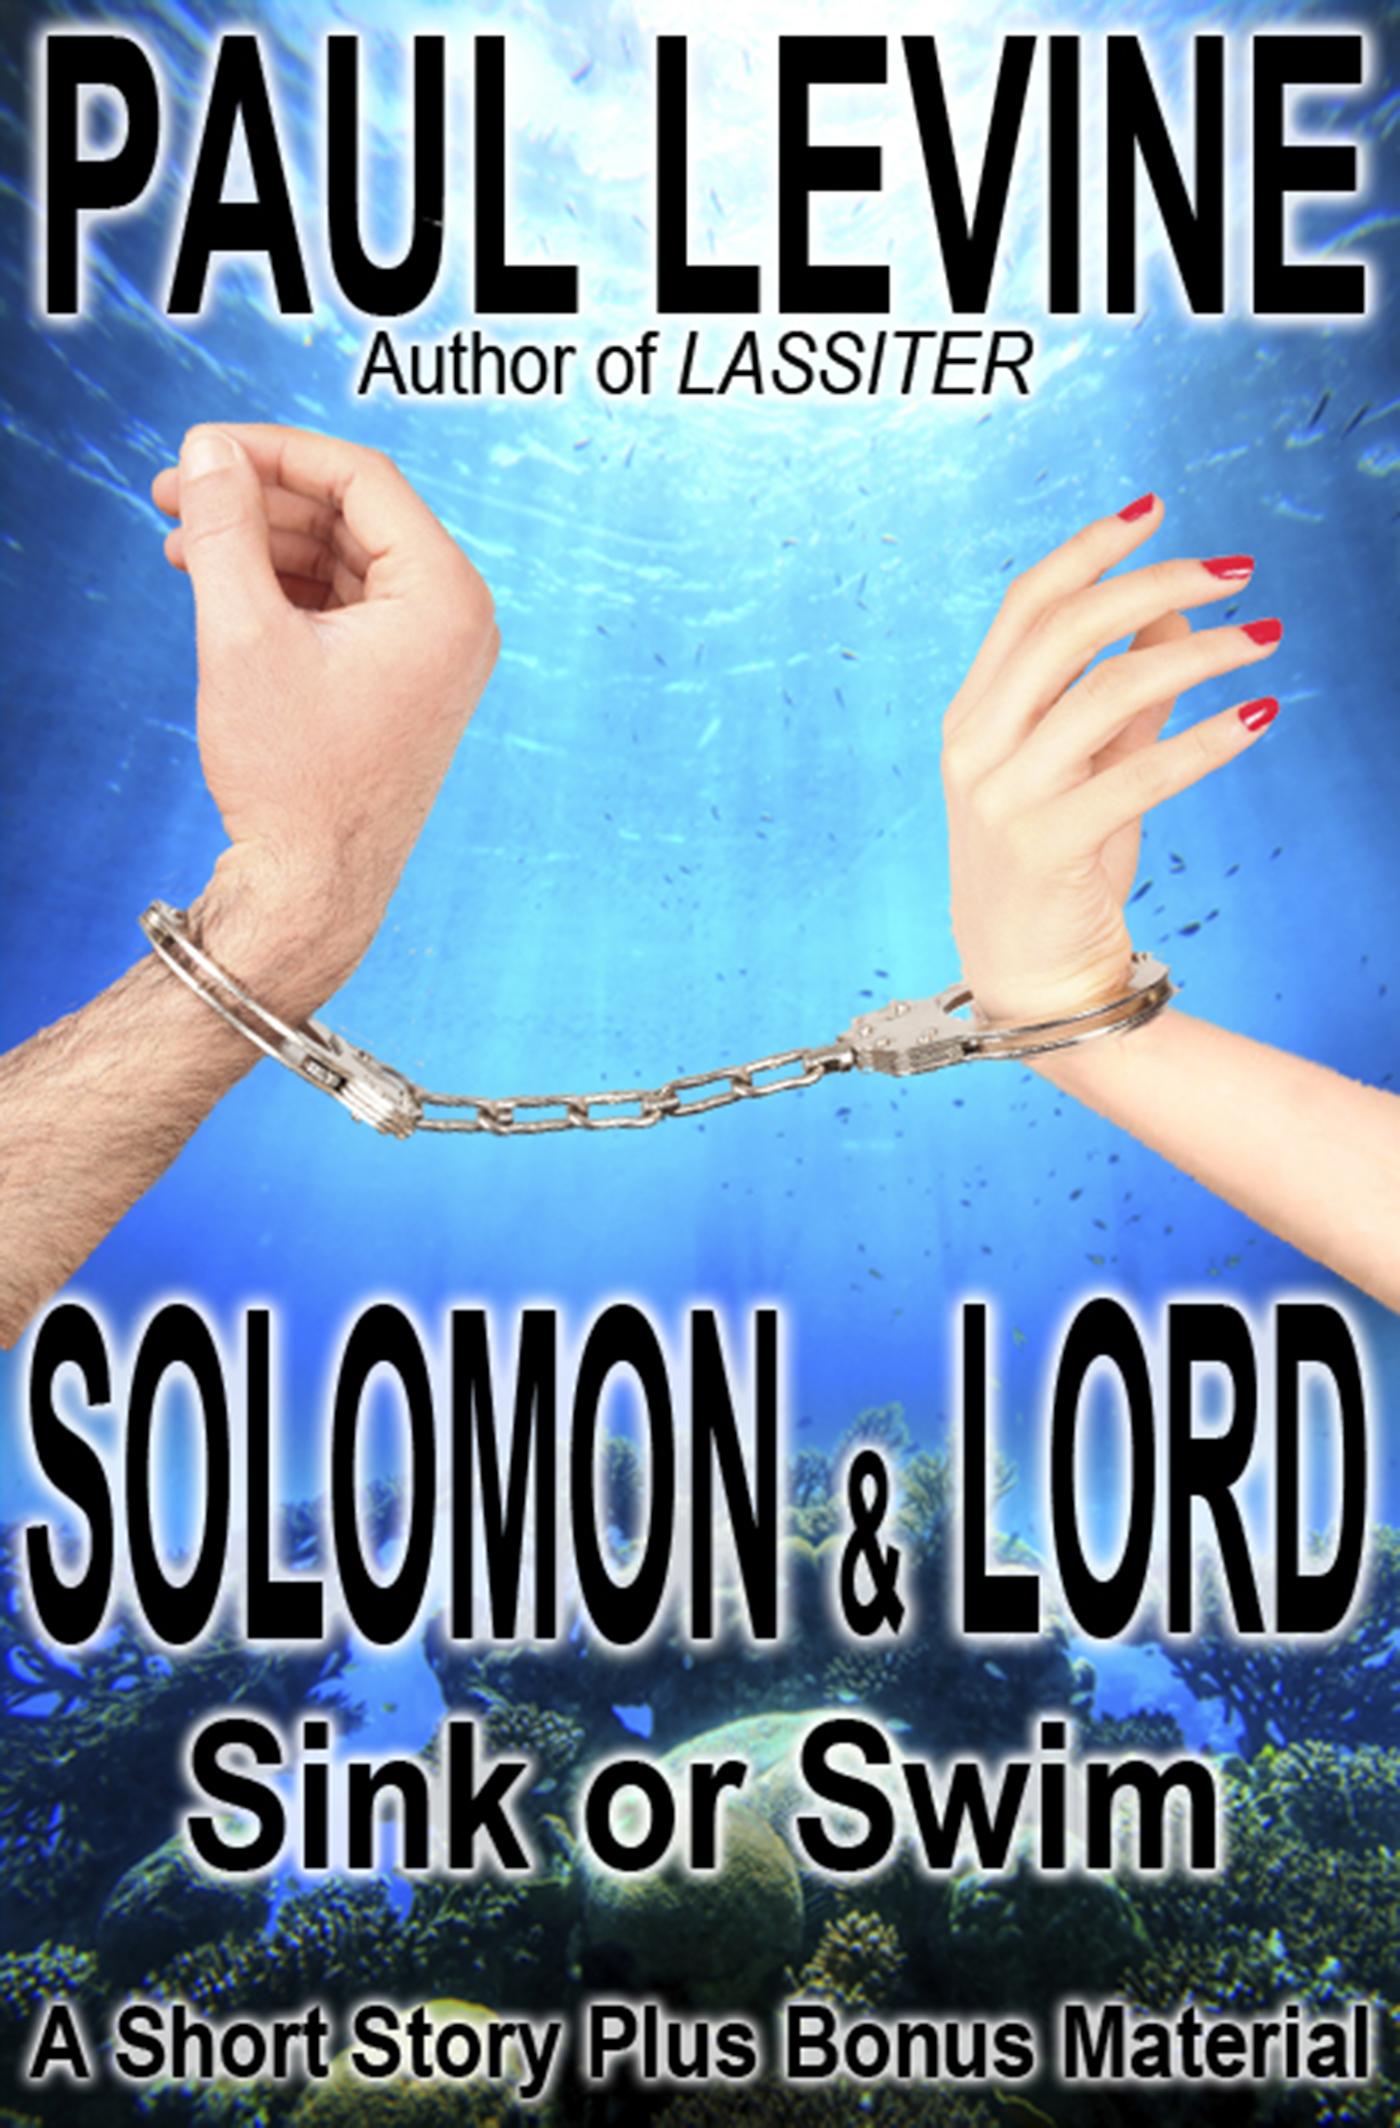 f22b24e676b8 Smashwords – Solomon   Lord Sink or Swim – a book by Paul Levine